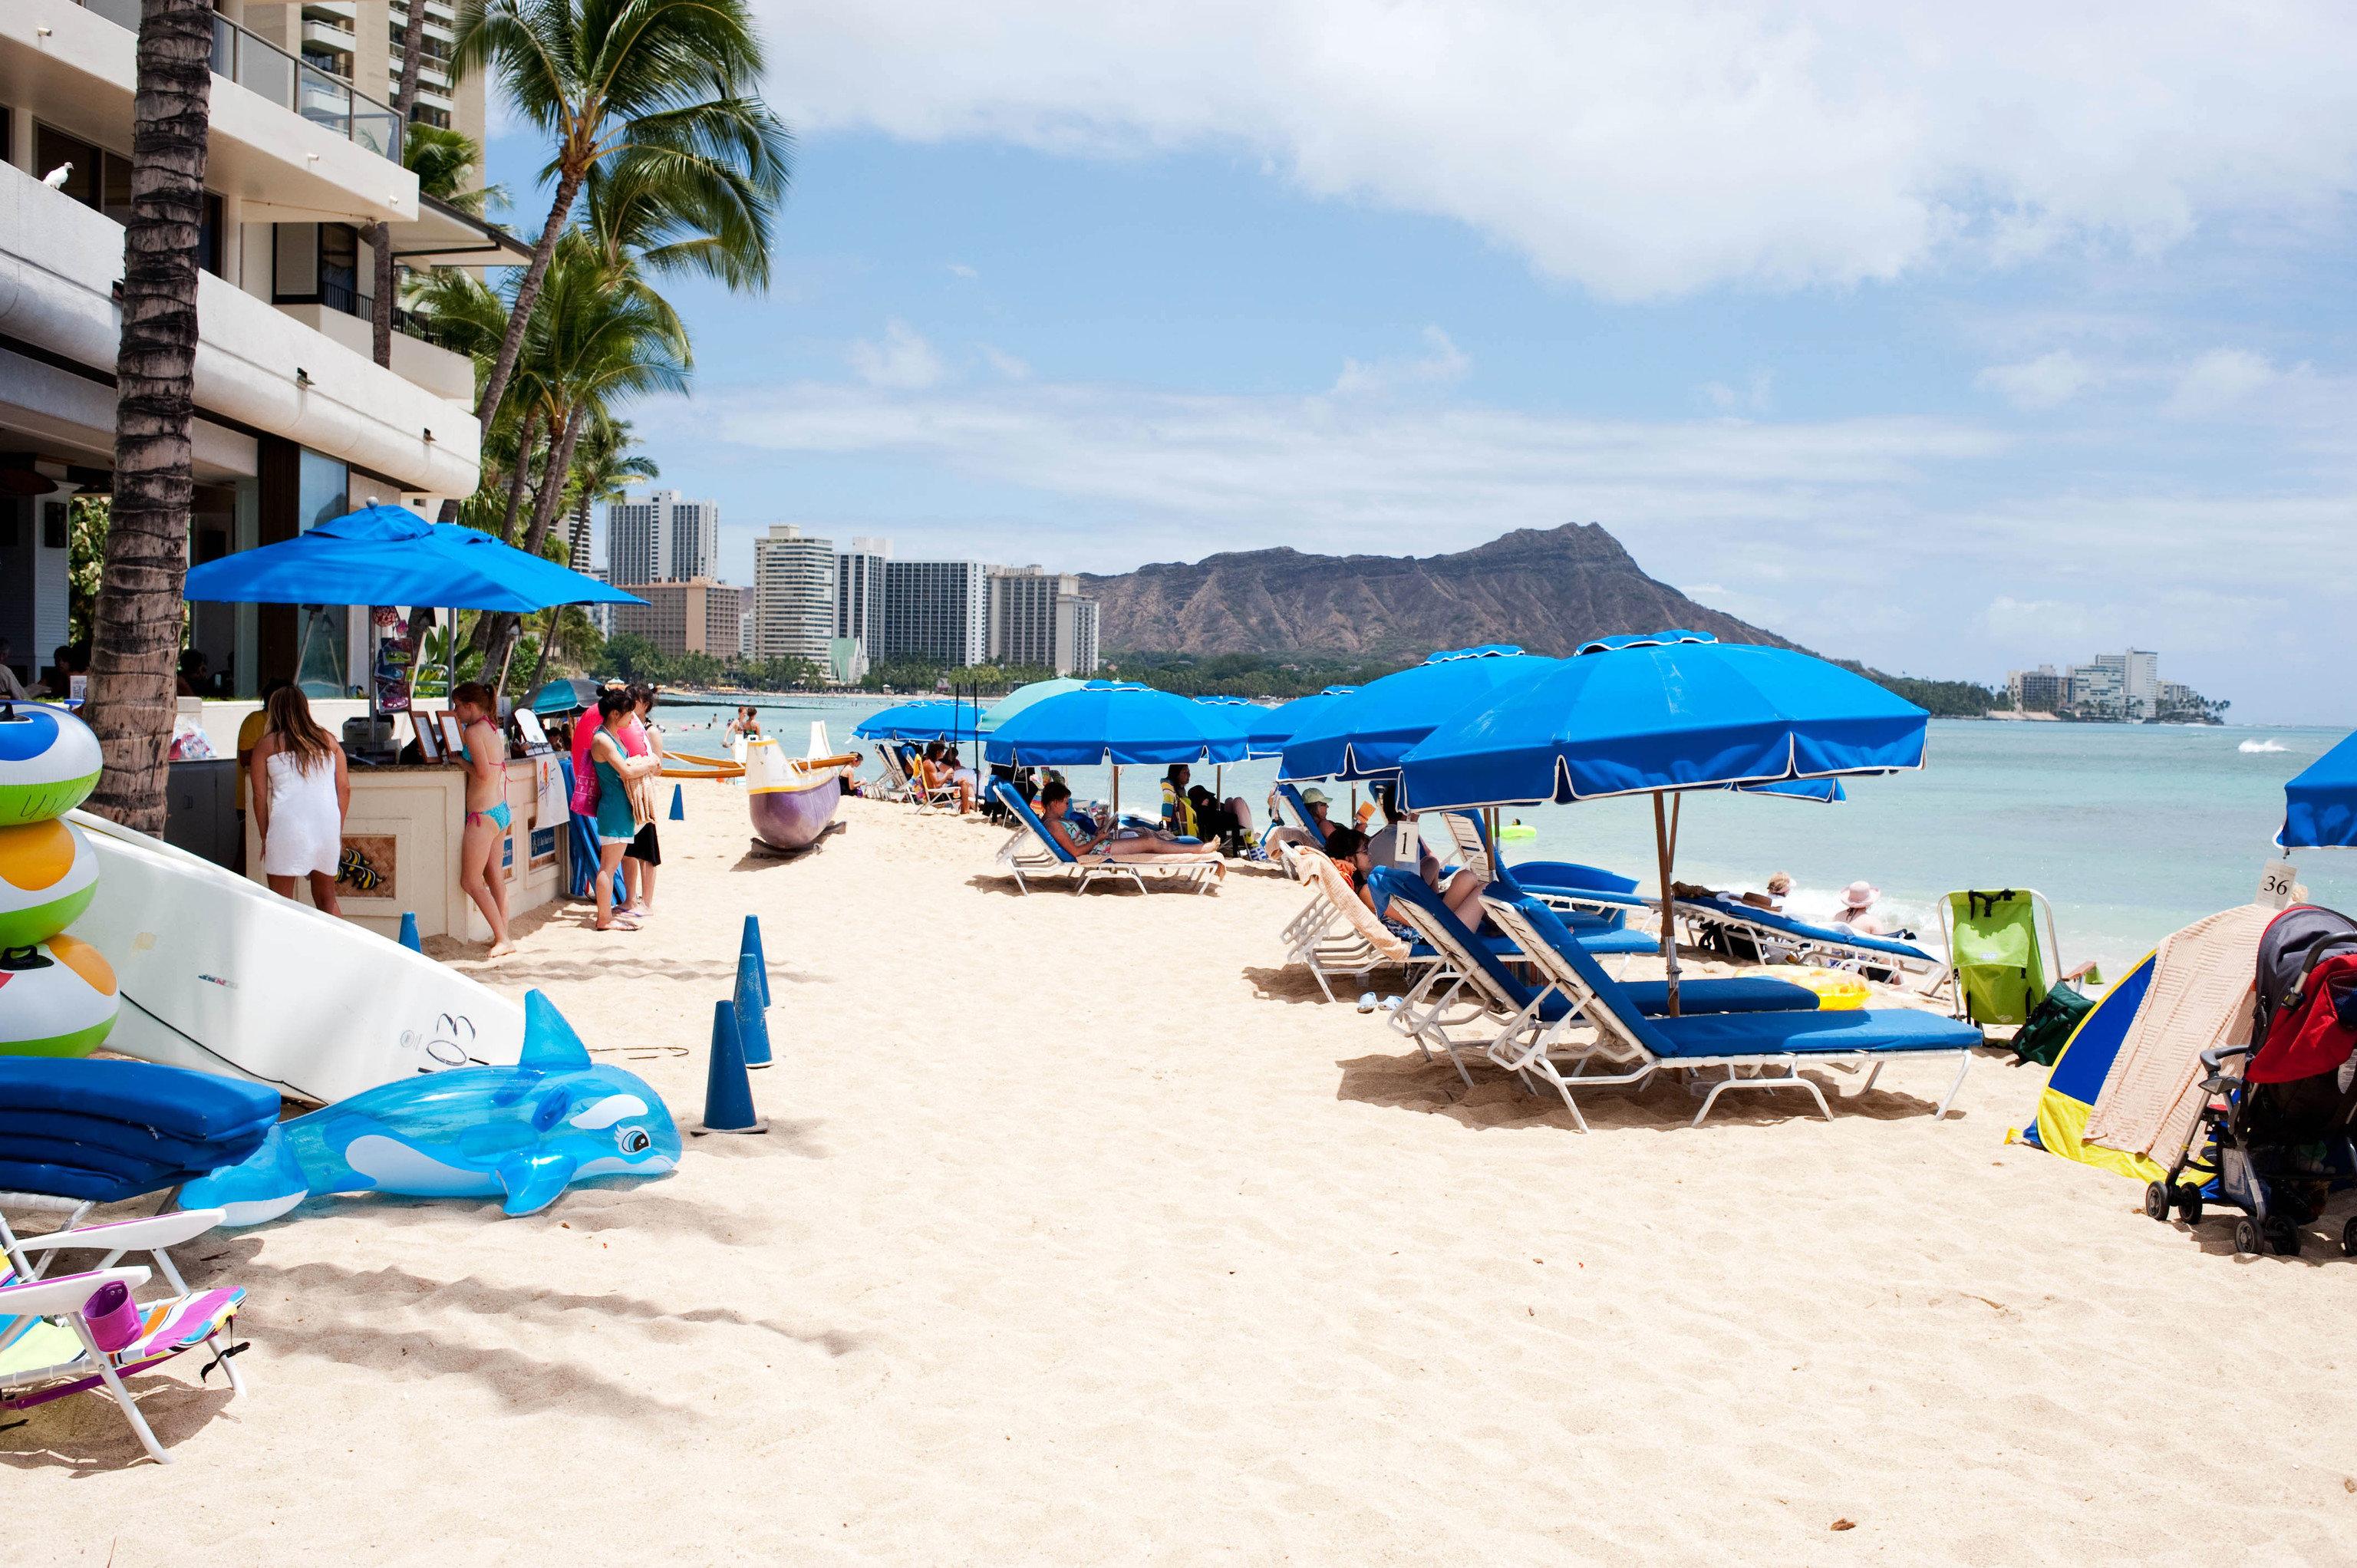 Beach ground umbrella leisure Sea Resort shore blue caribbean lined day enjoying sandy shade